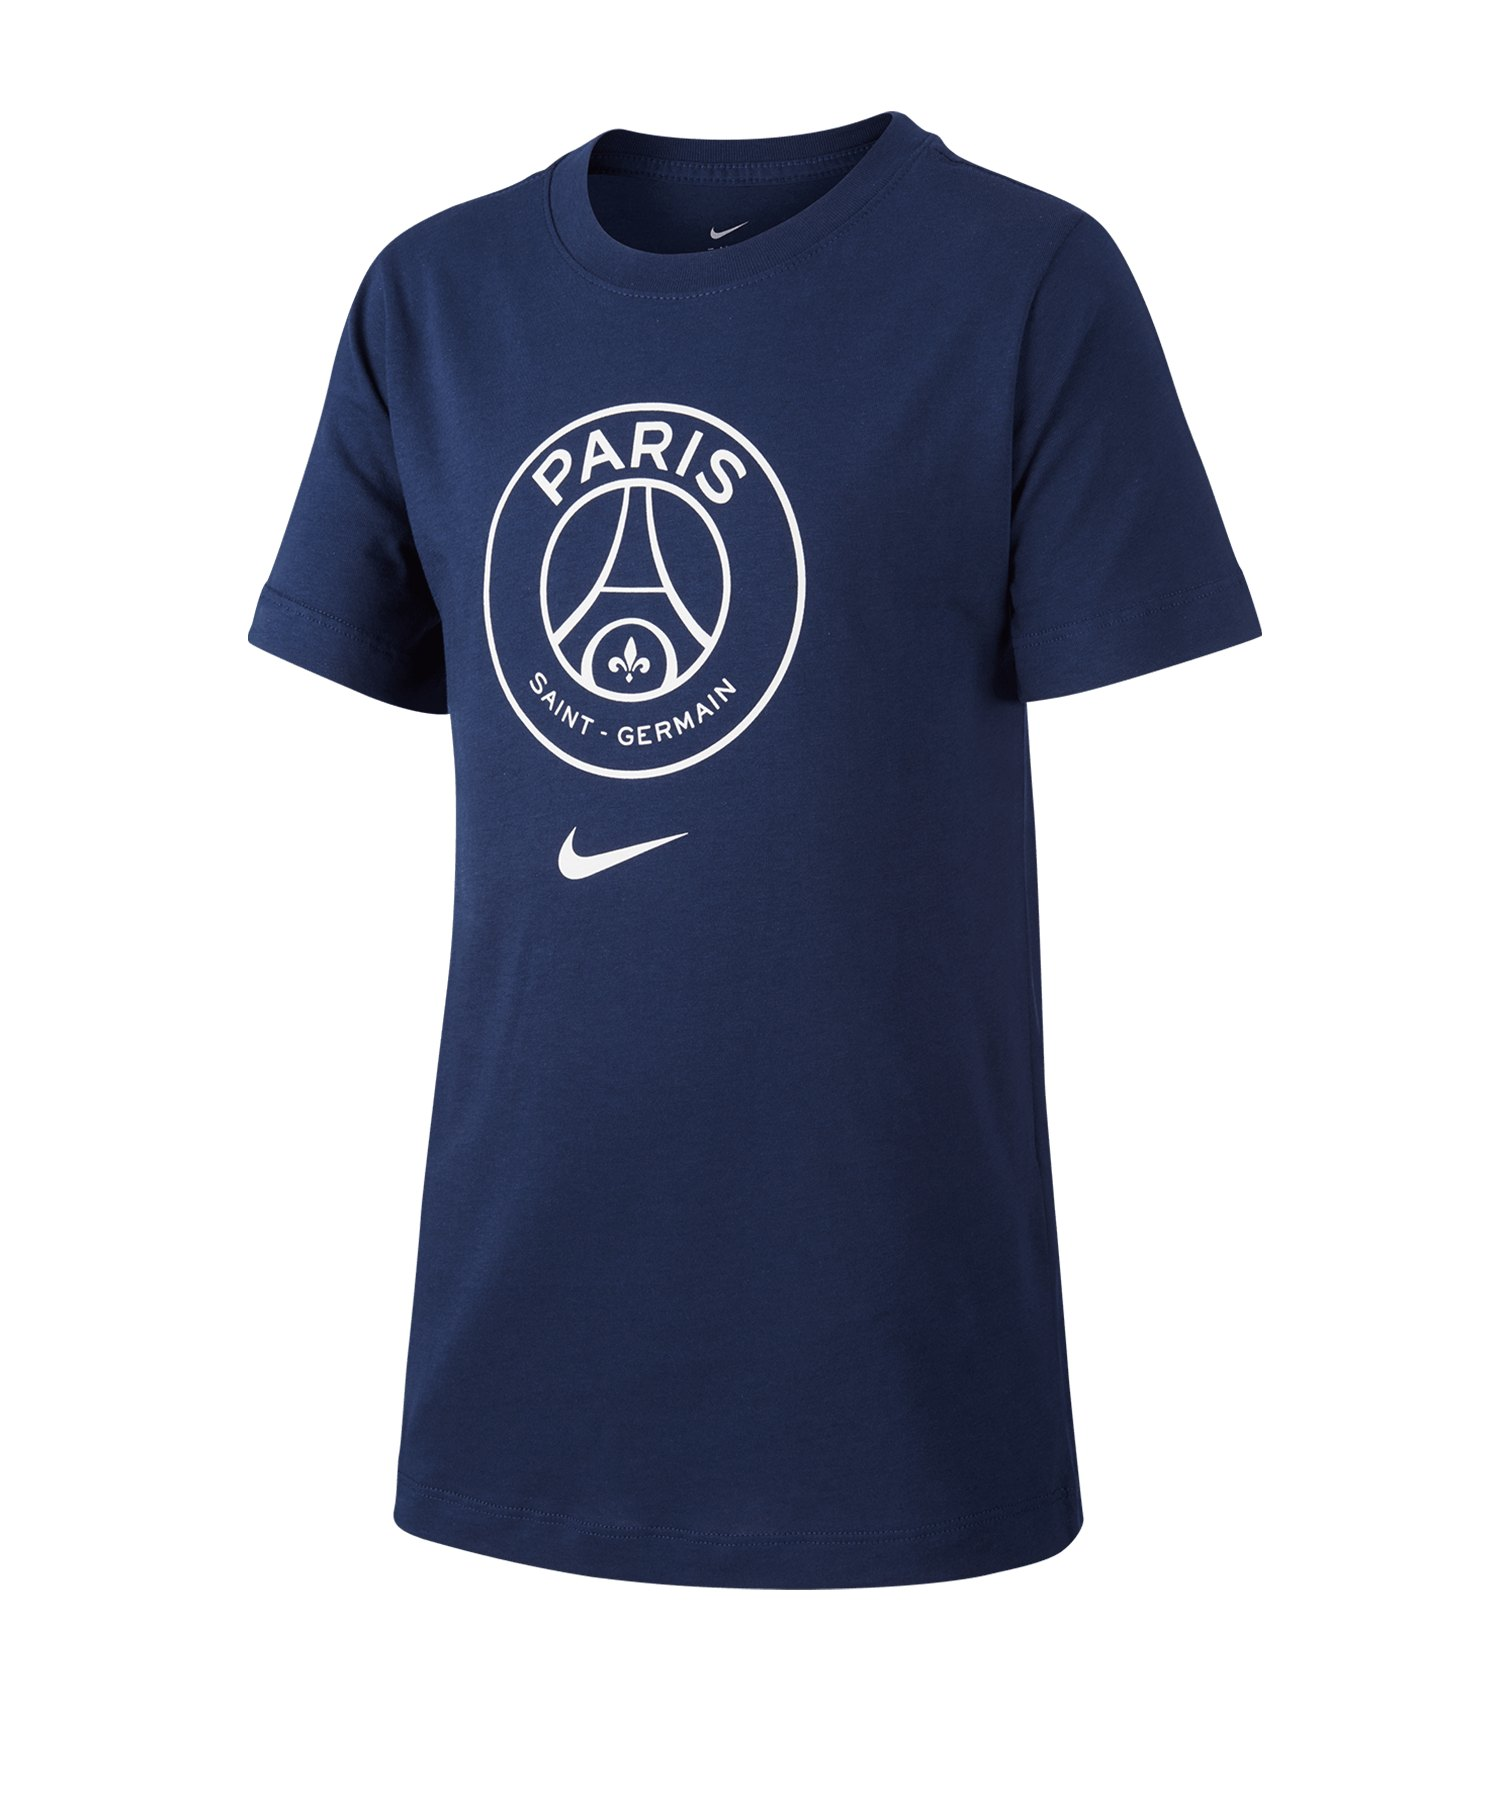 Jordan Paris St. Germain Crest T-Shirt Kids F411 - blau